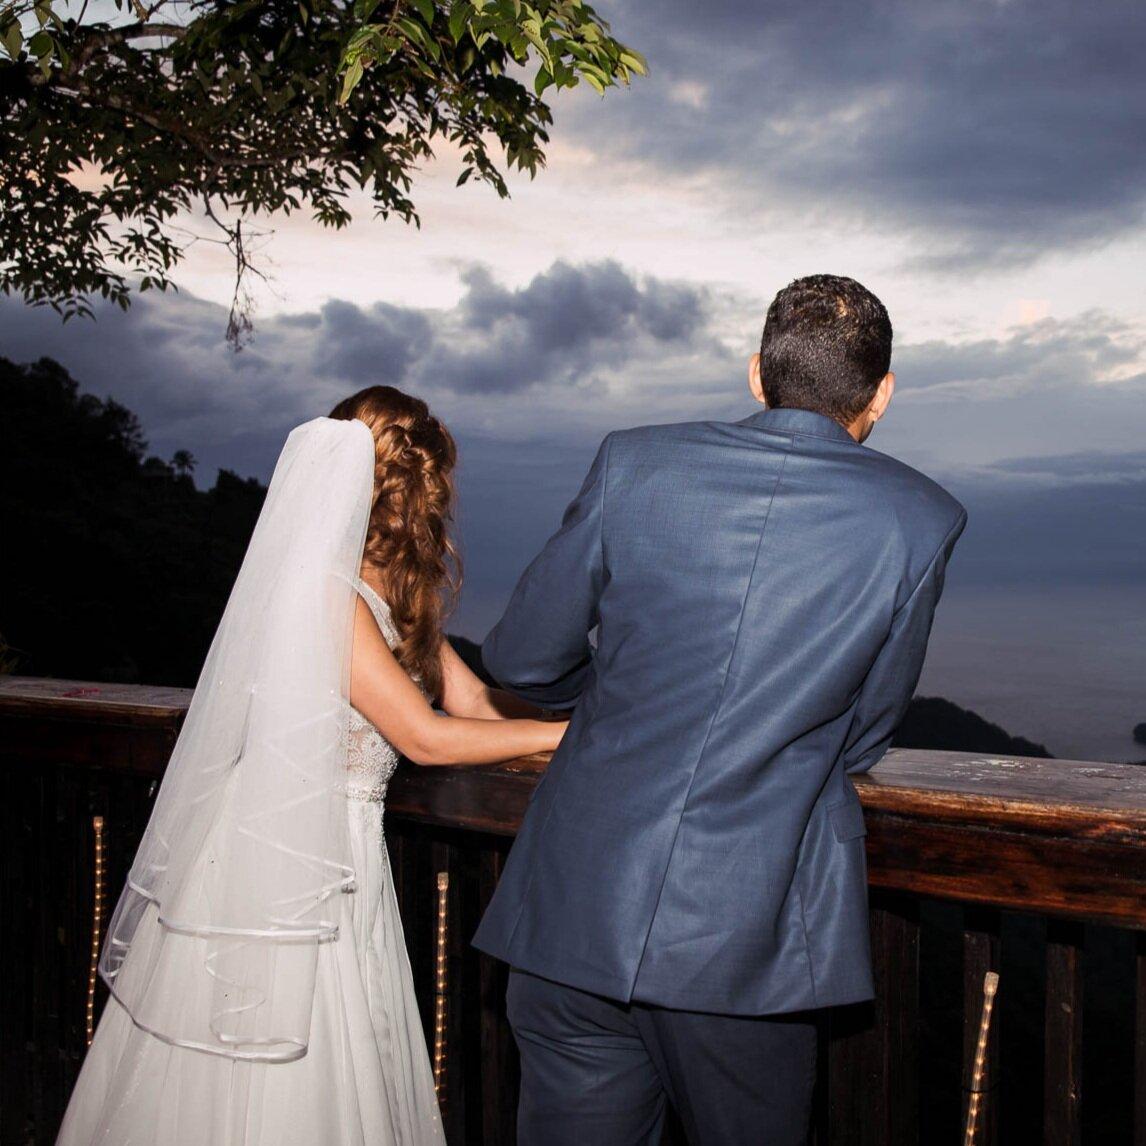 North+Deck+Wedding+Trinidad+26.jpg